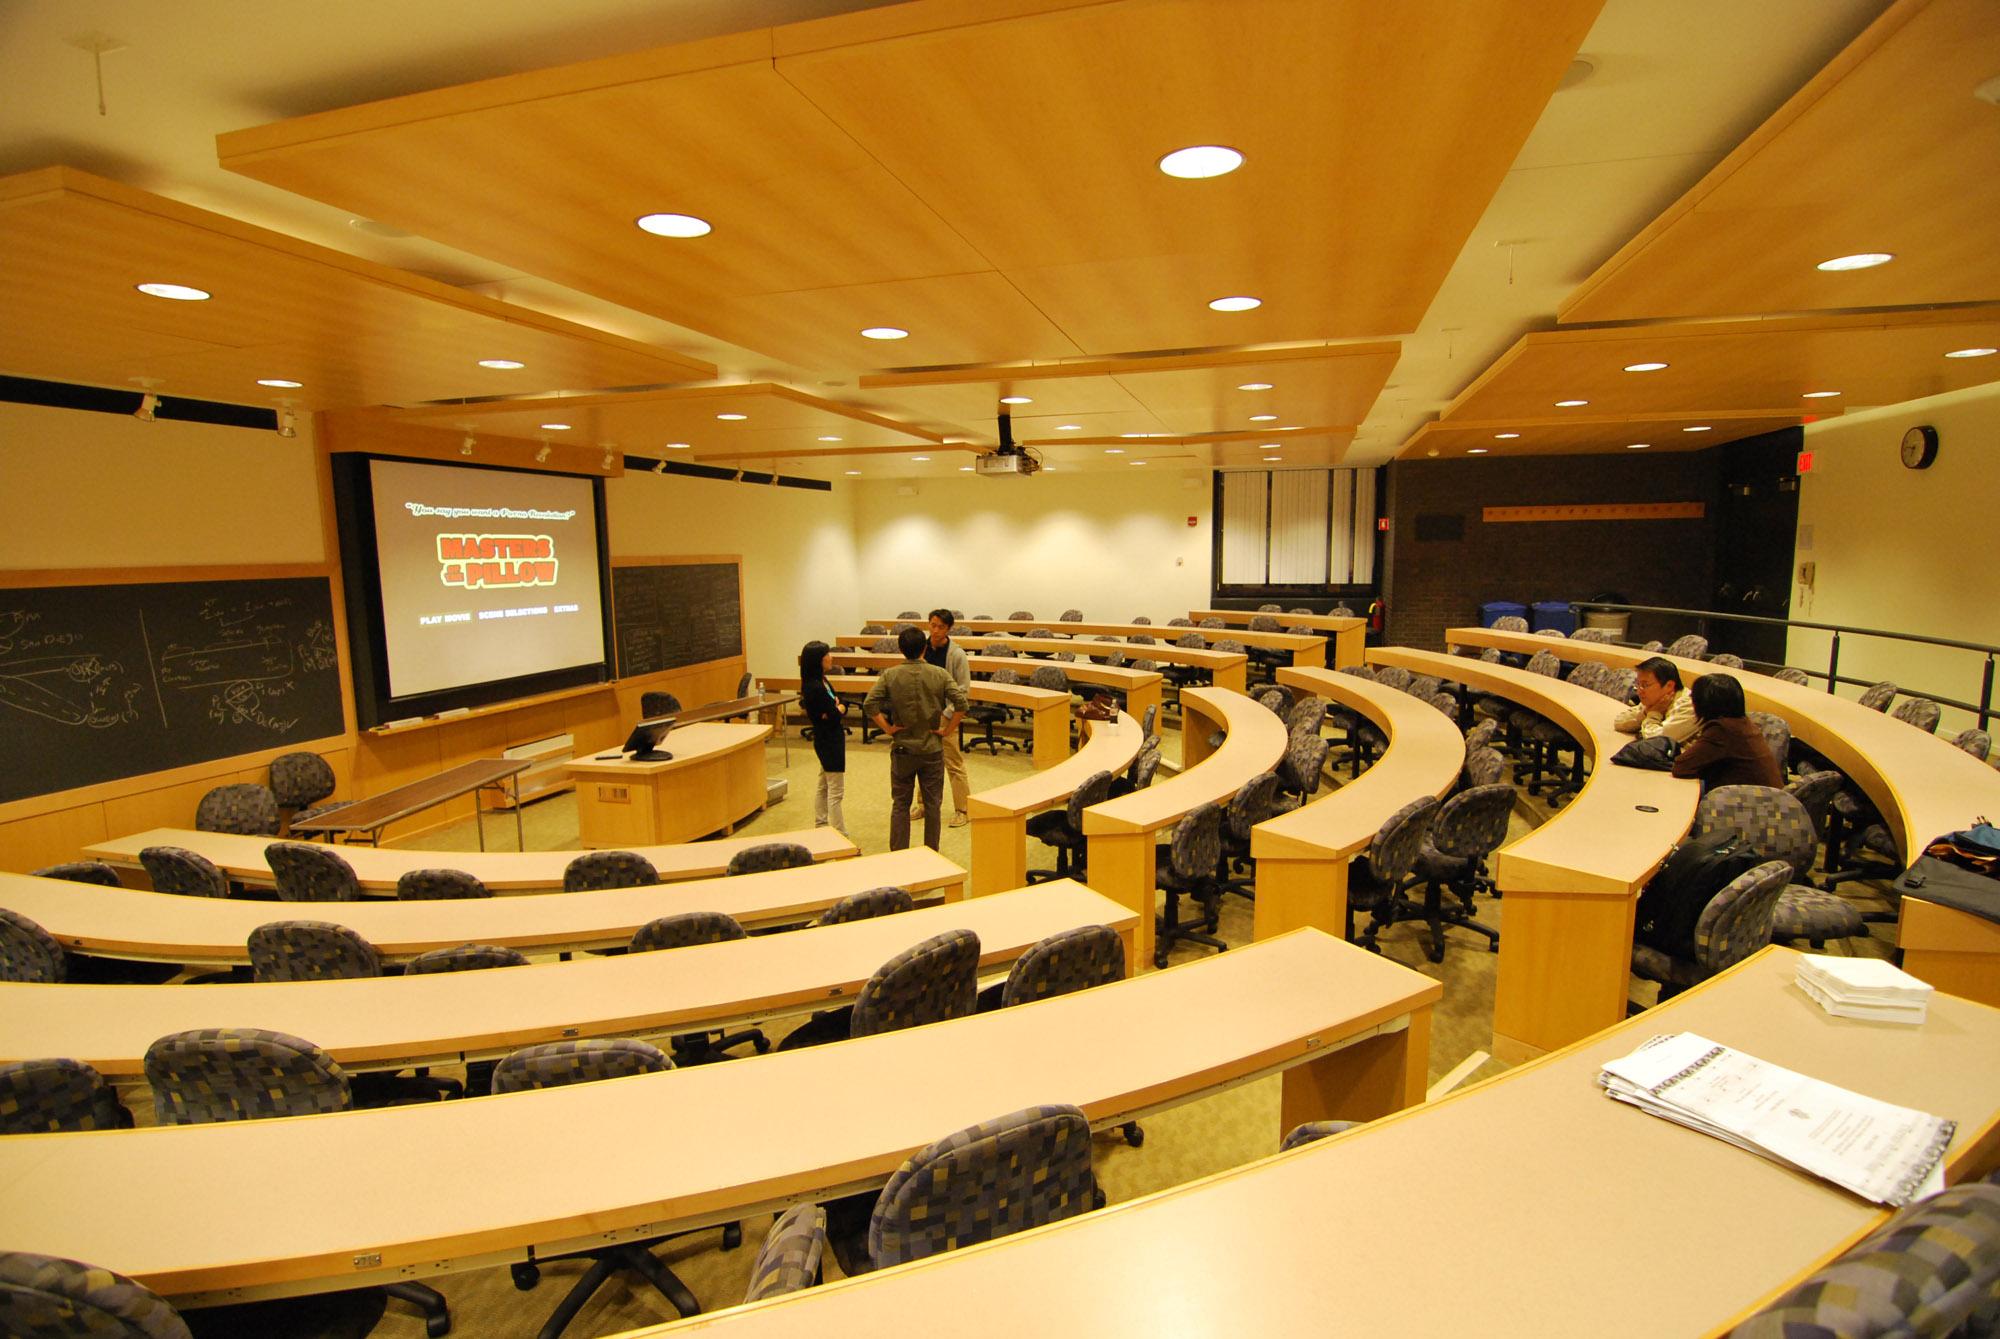 Harvard Law School Wikipedia plusarquitecturainfo